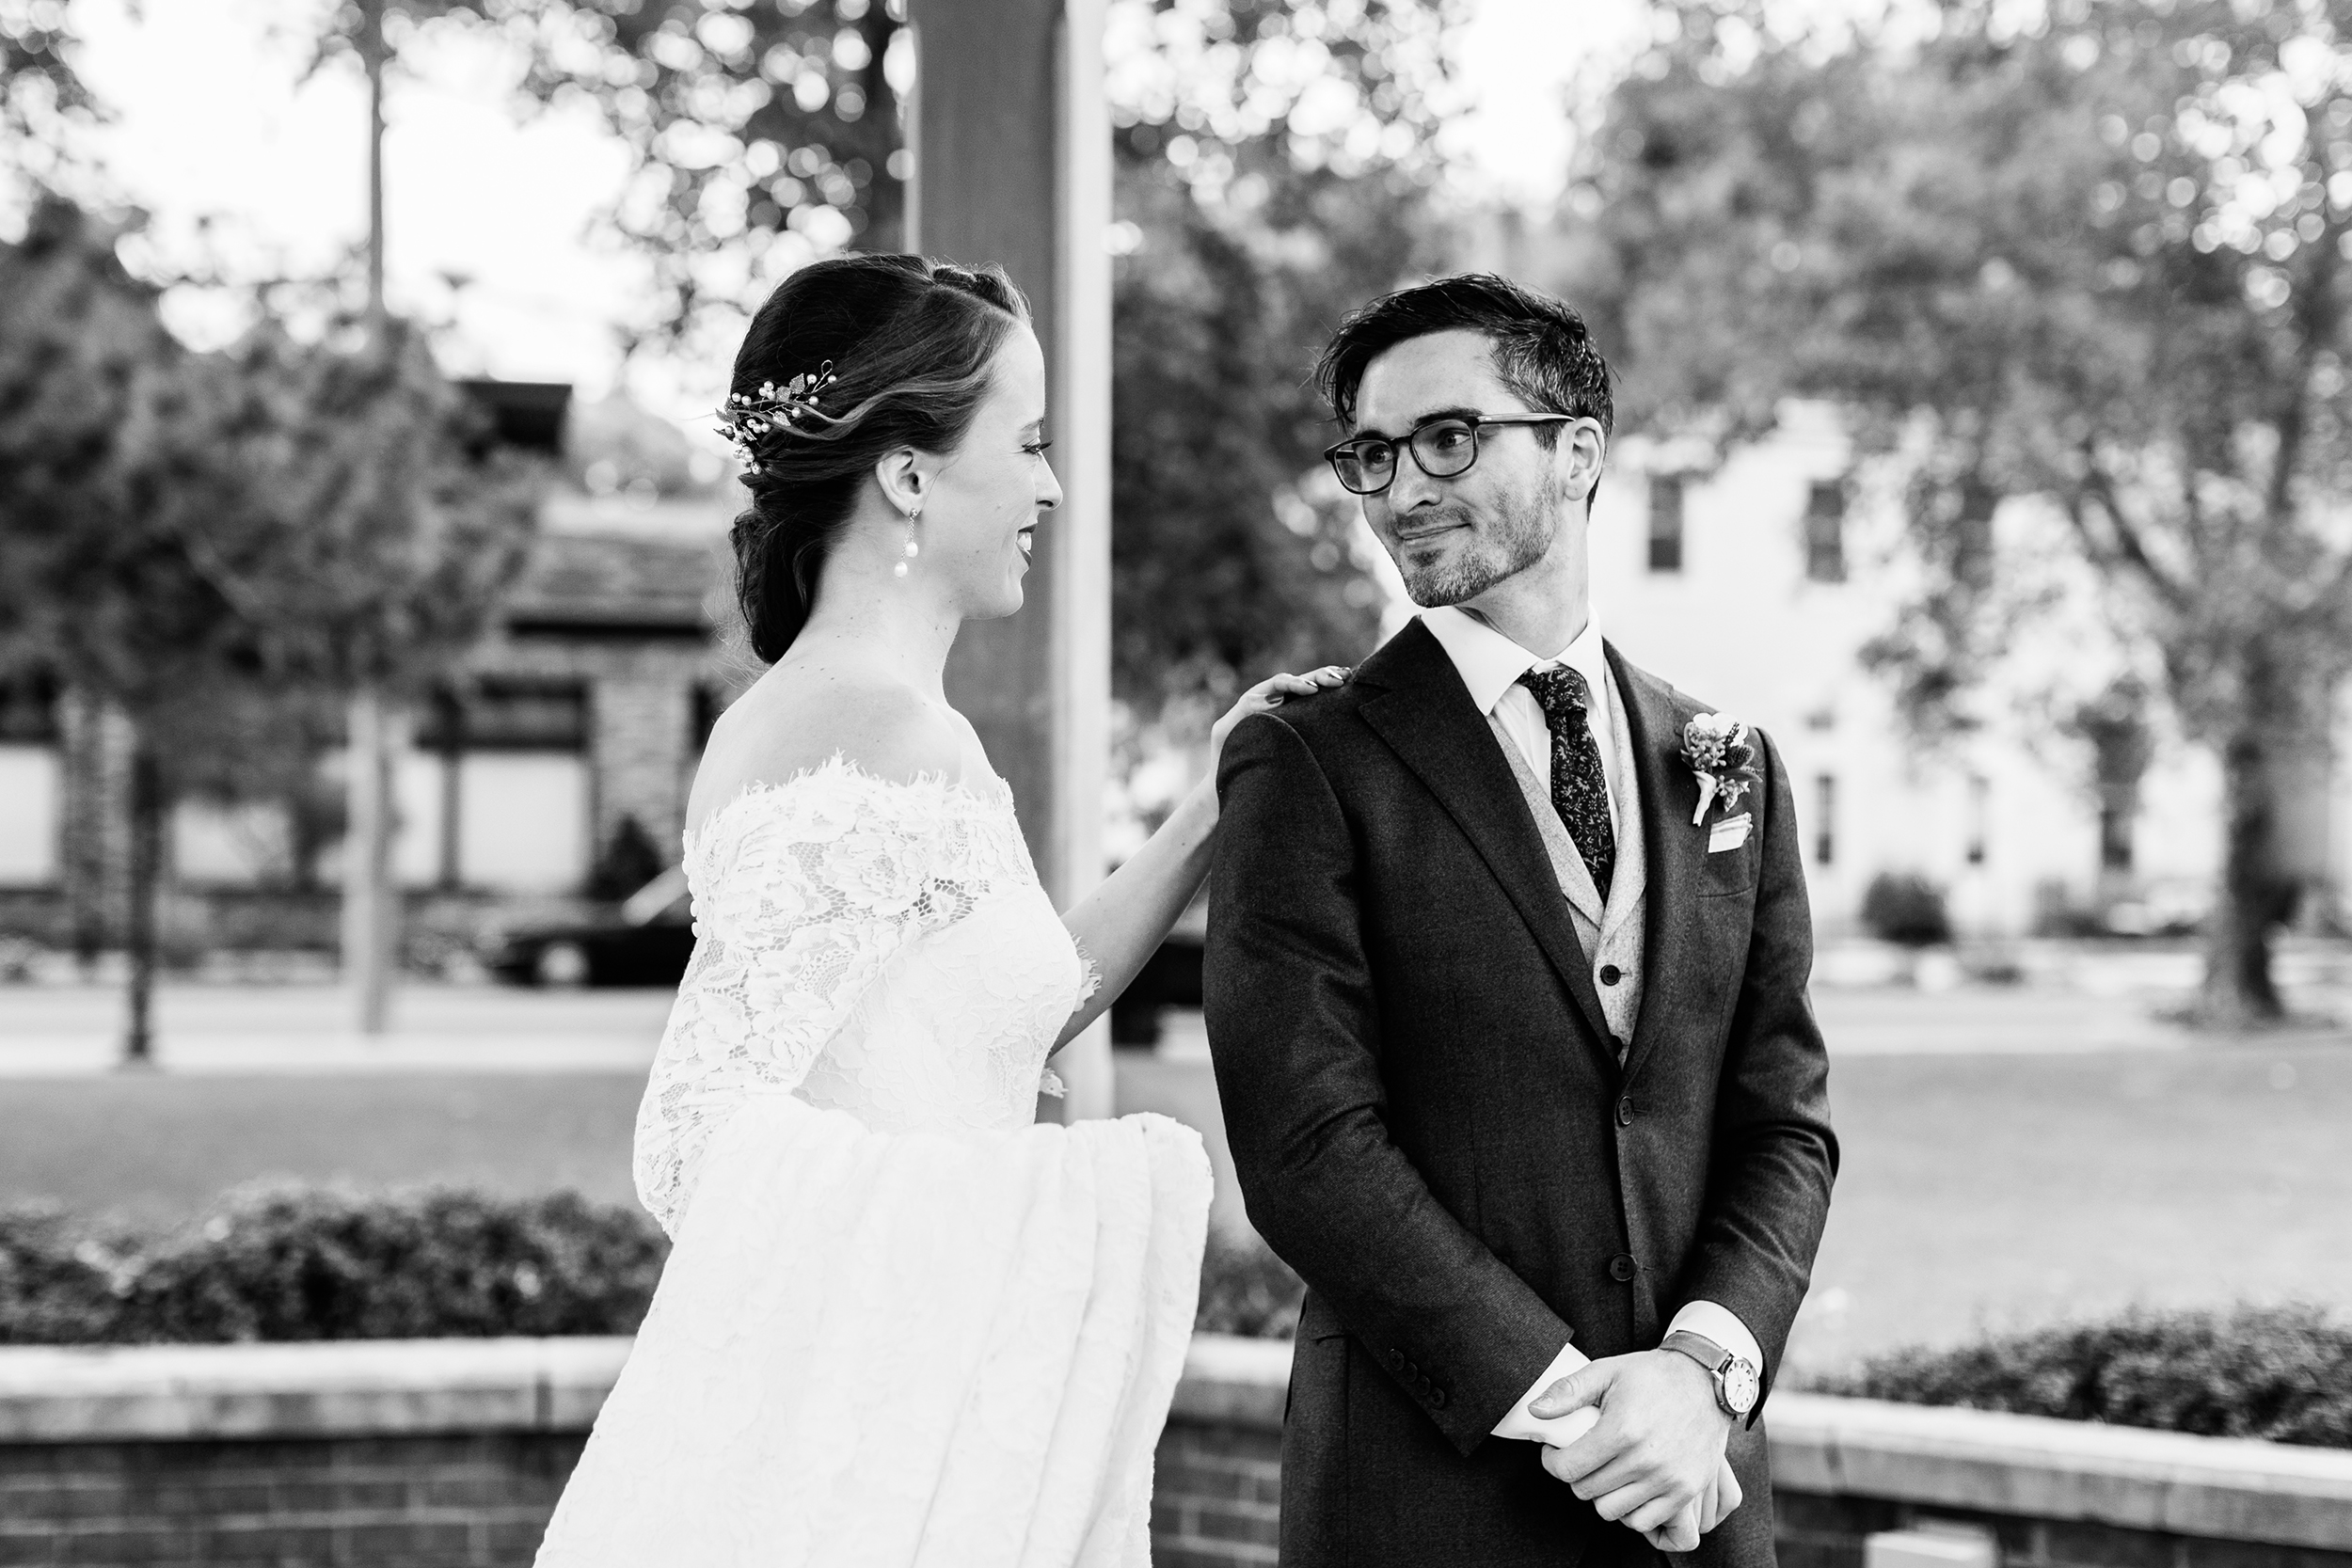 KarliCadel-Wedding-RachelChad-8684.jpg